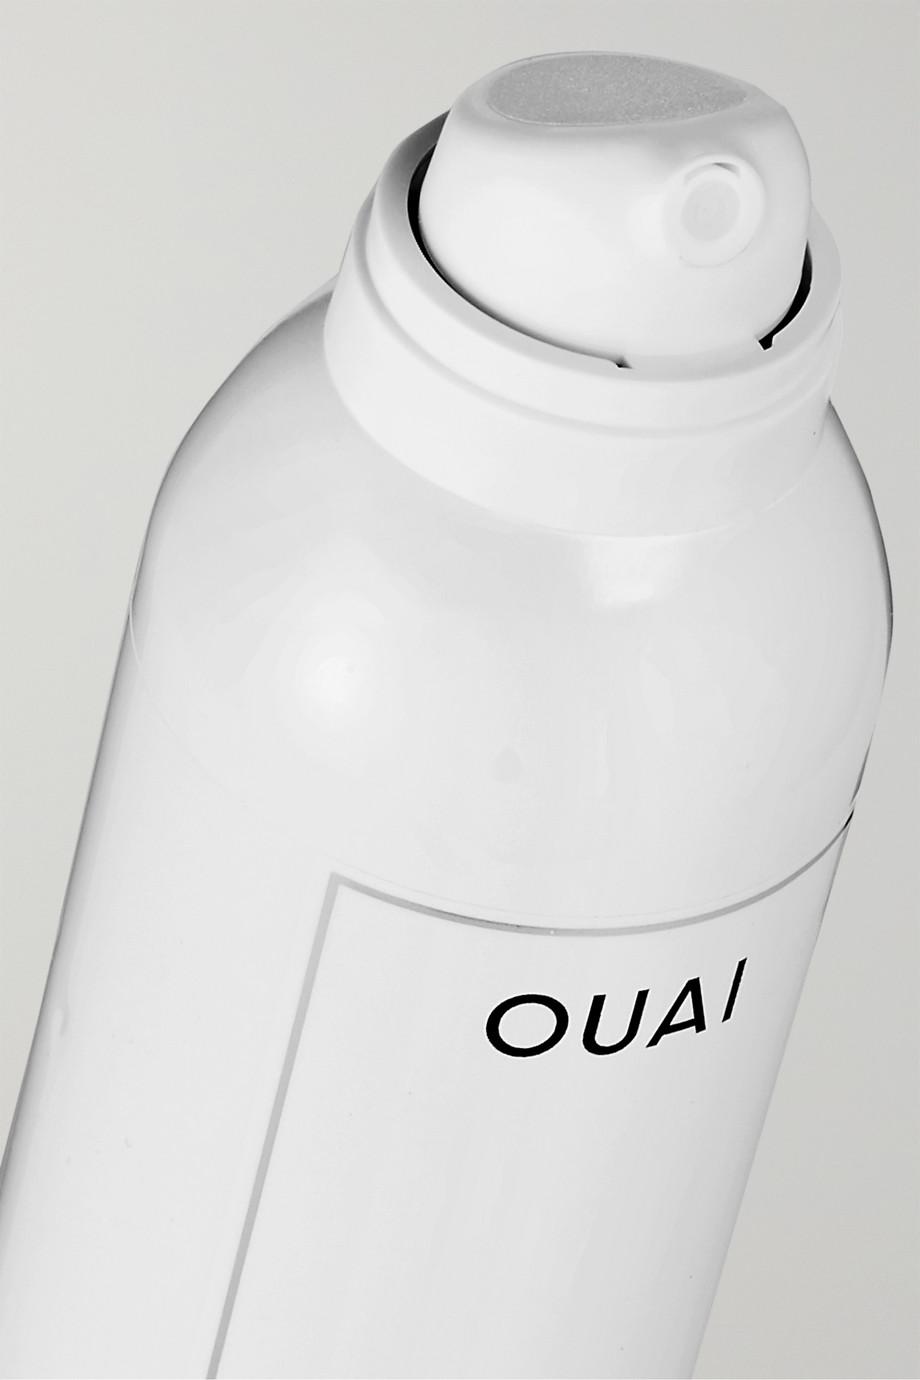 OUAI Haircare Super Dry Shampoo, 127g